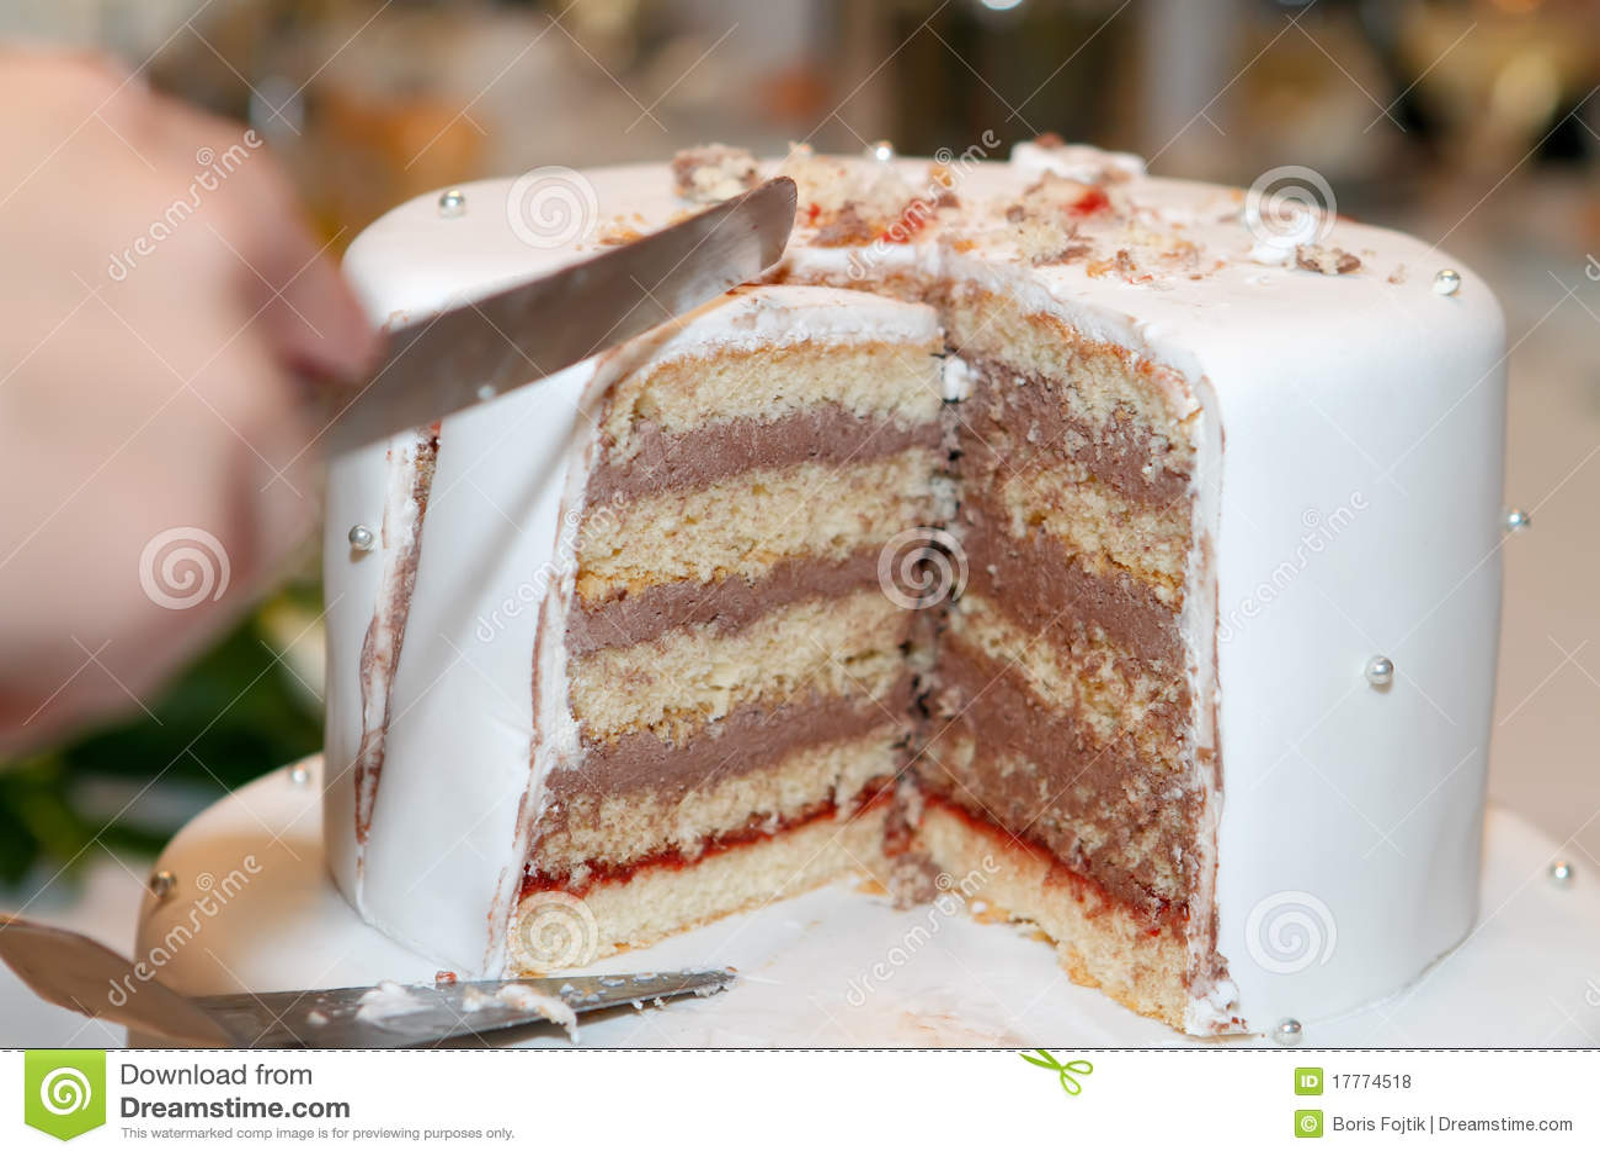 Cutting The Wedding Cake Royalty Free Stock Photos